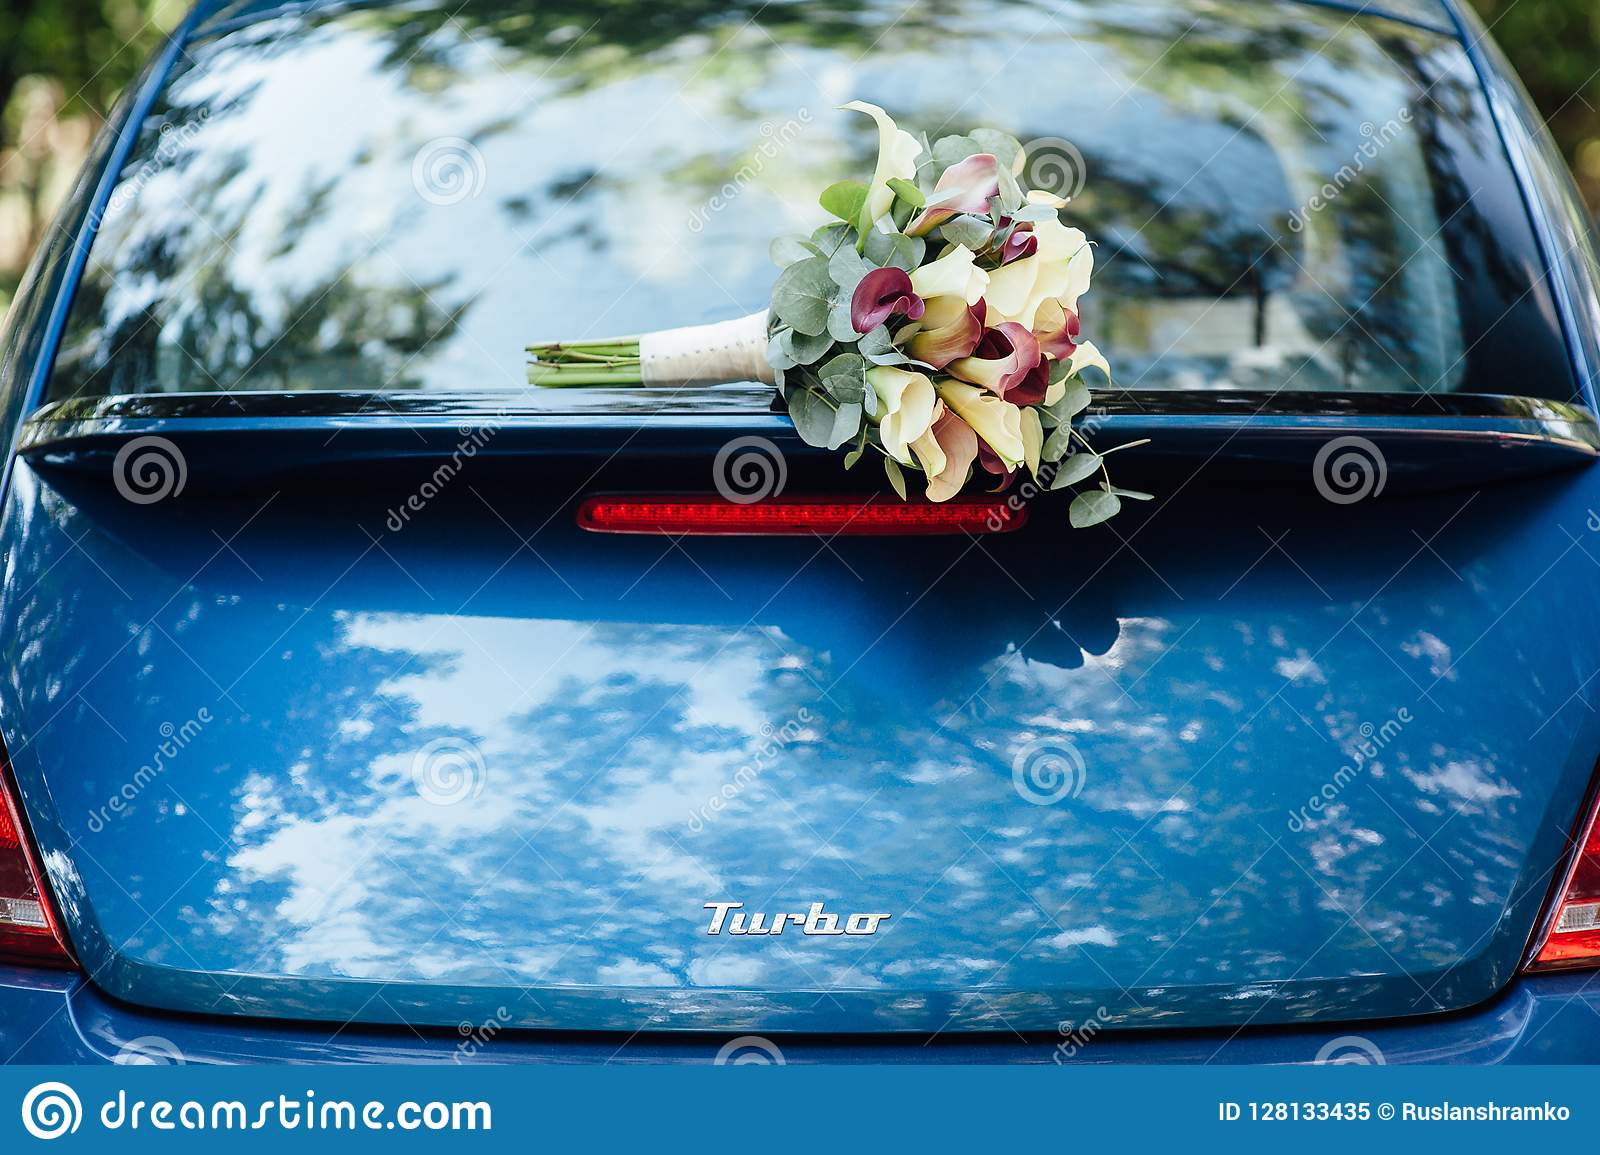 A Wedding Bouquet Lies On A Beautiful Blue Car Wedding